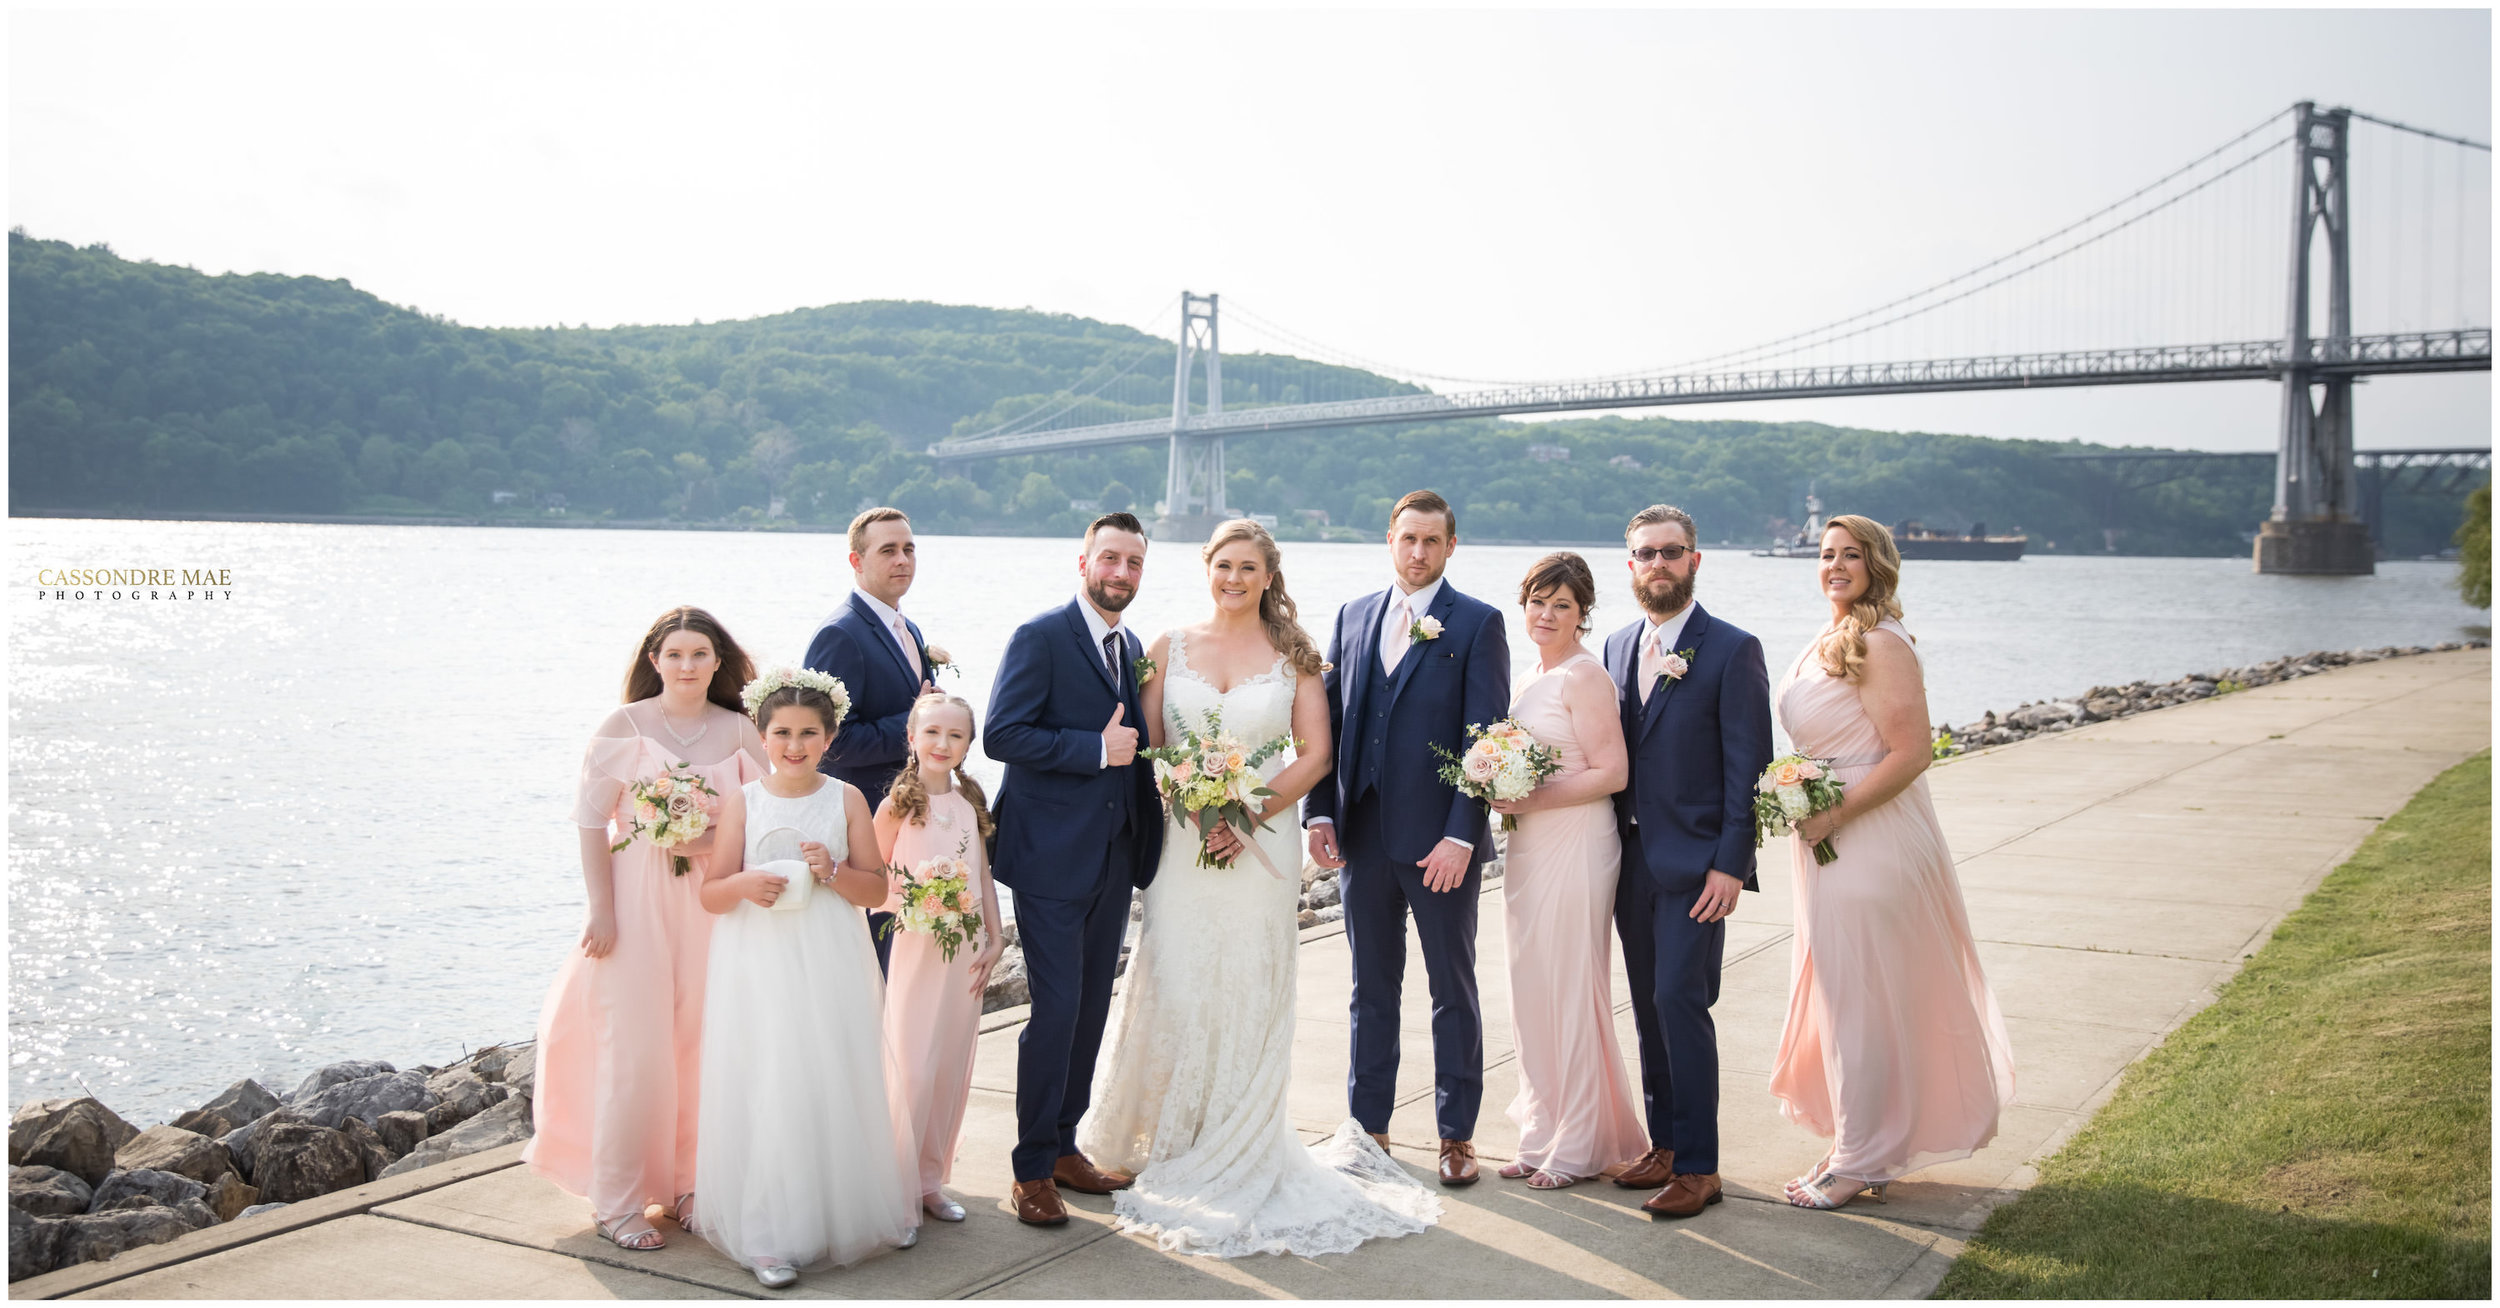 Cassondre Mae Photography Grandview Wedding Photos Poughkeepsie NY Hudson Valley 18.jpg